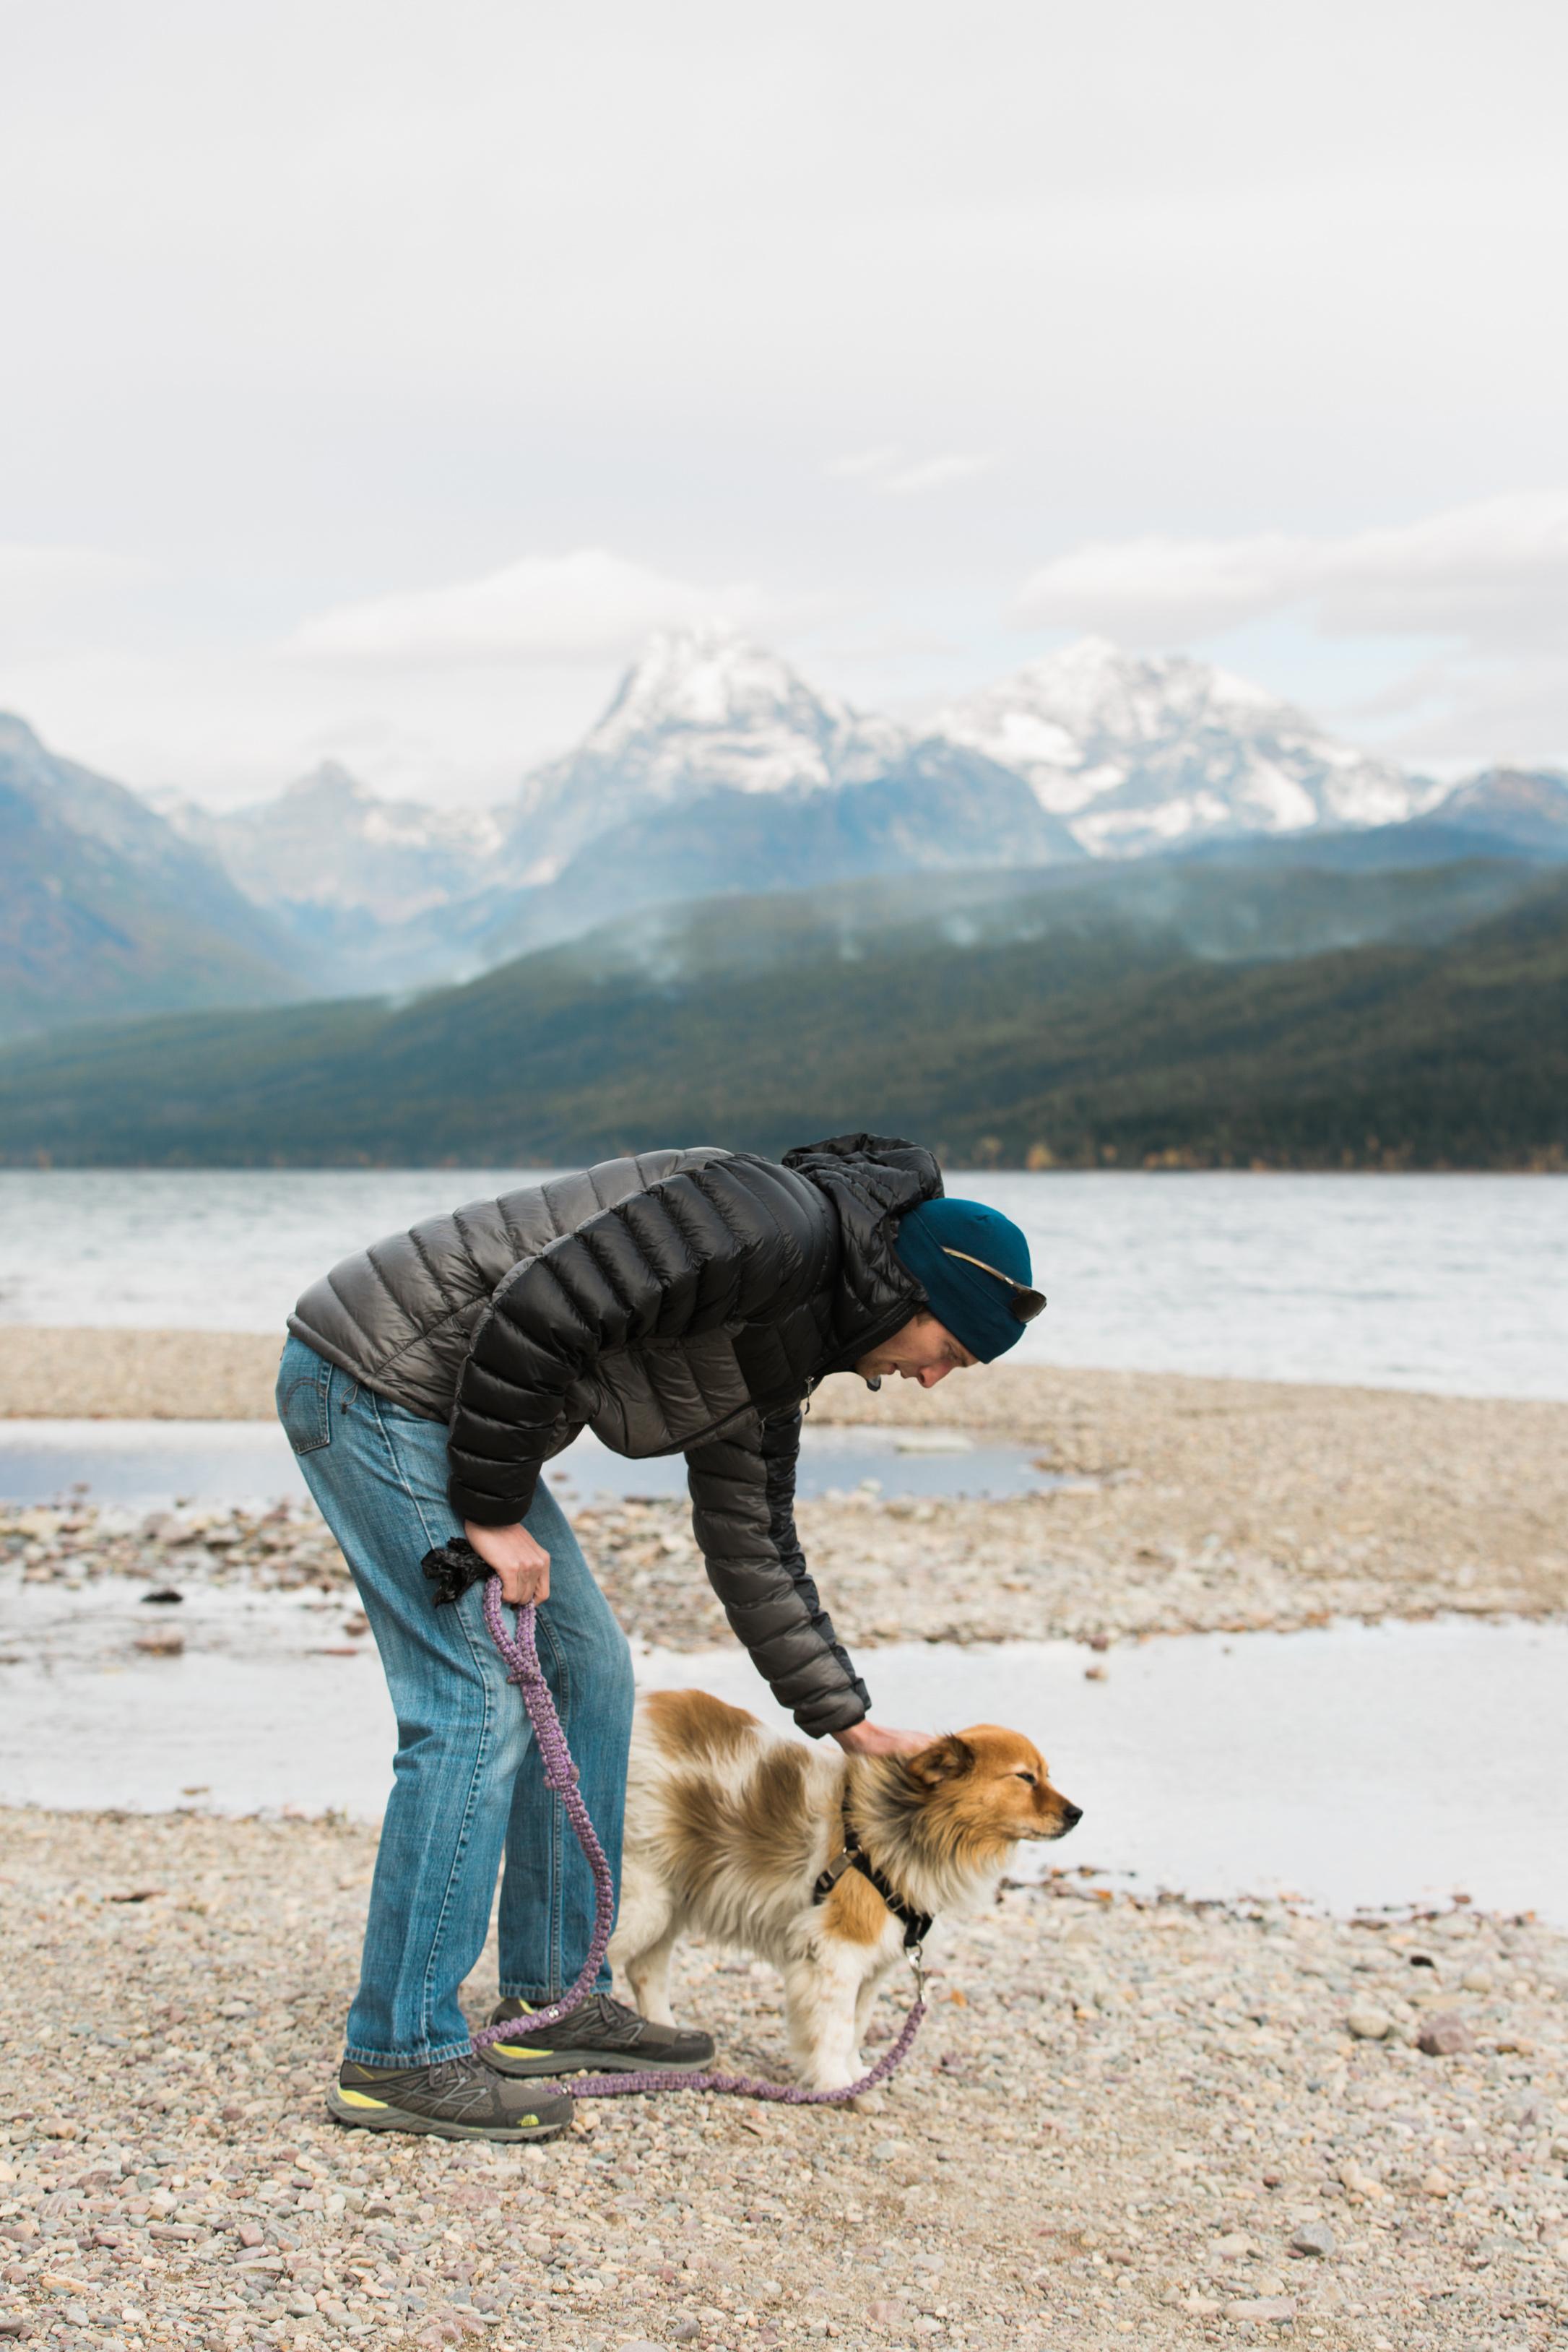 CindyGiovagnoli_Glacier_National_Park_Montana_mountains_lake_fall_autumn_road_trip-006.jpg